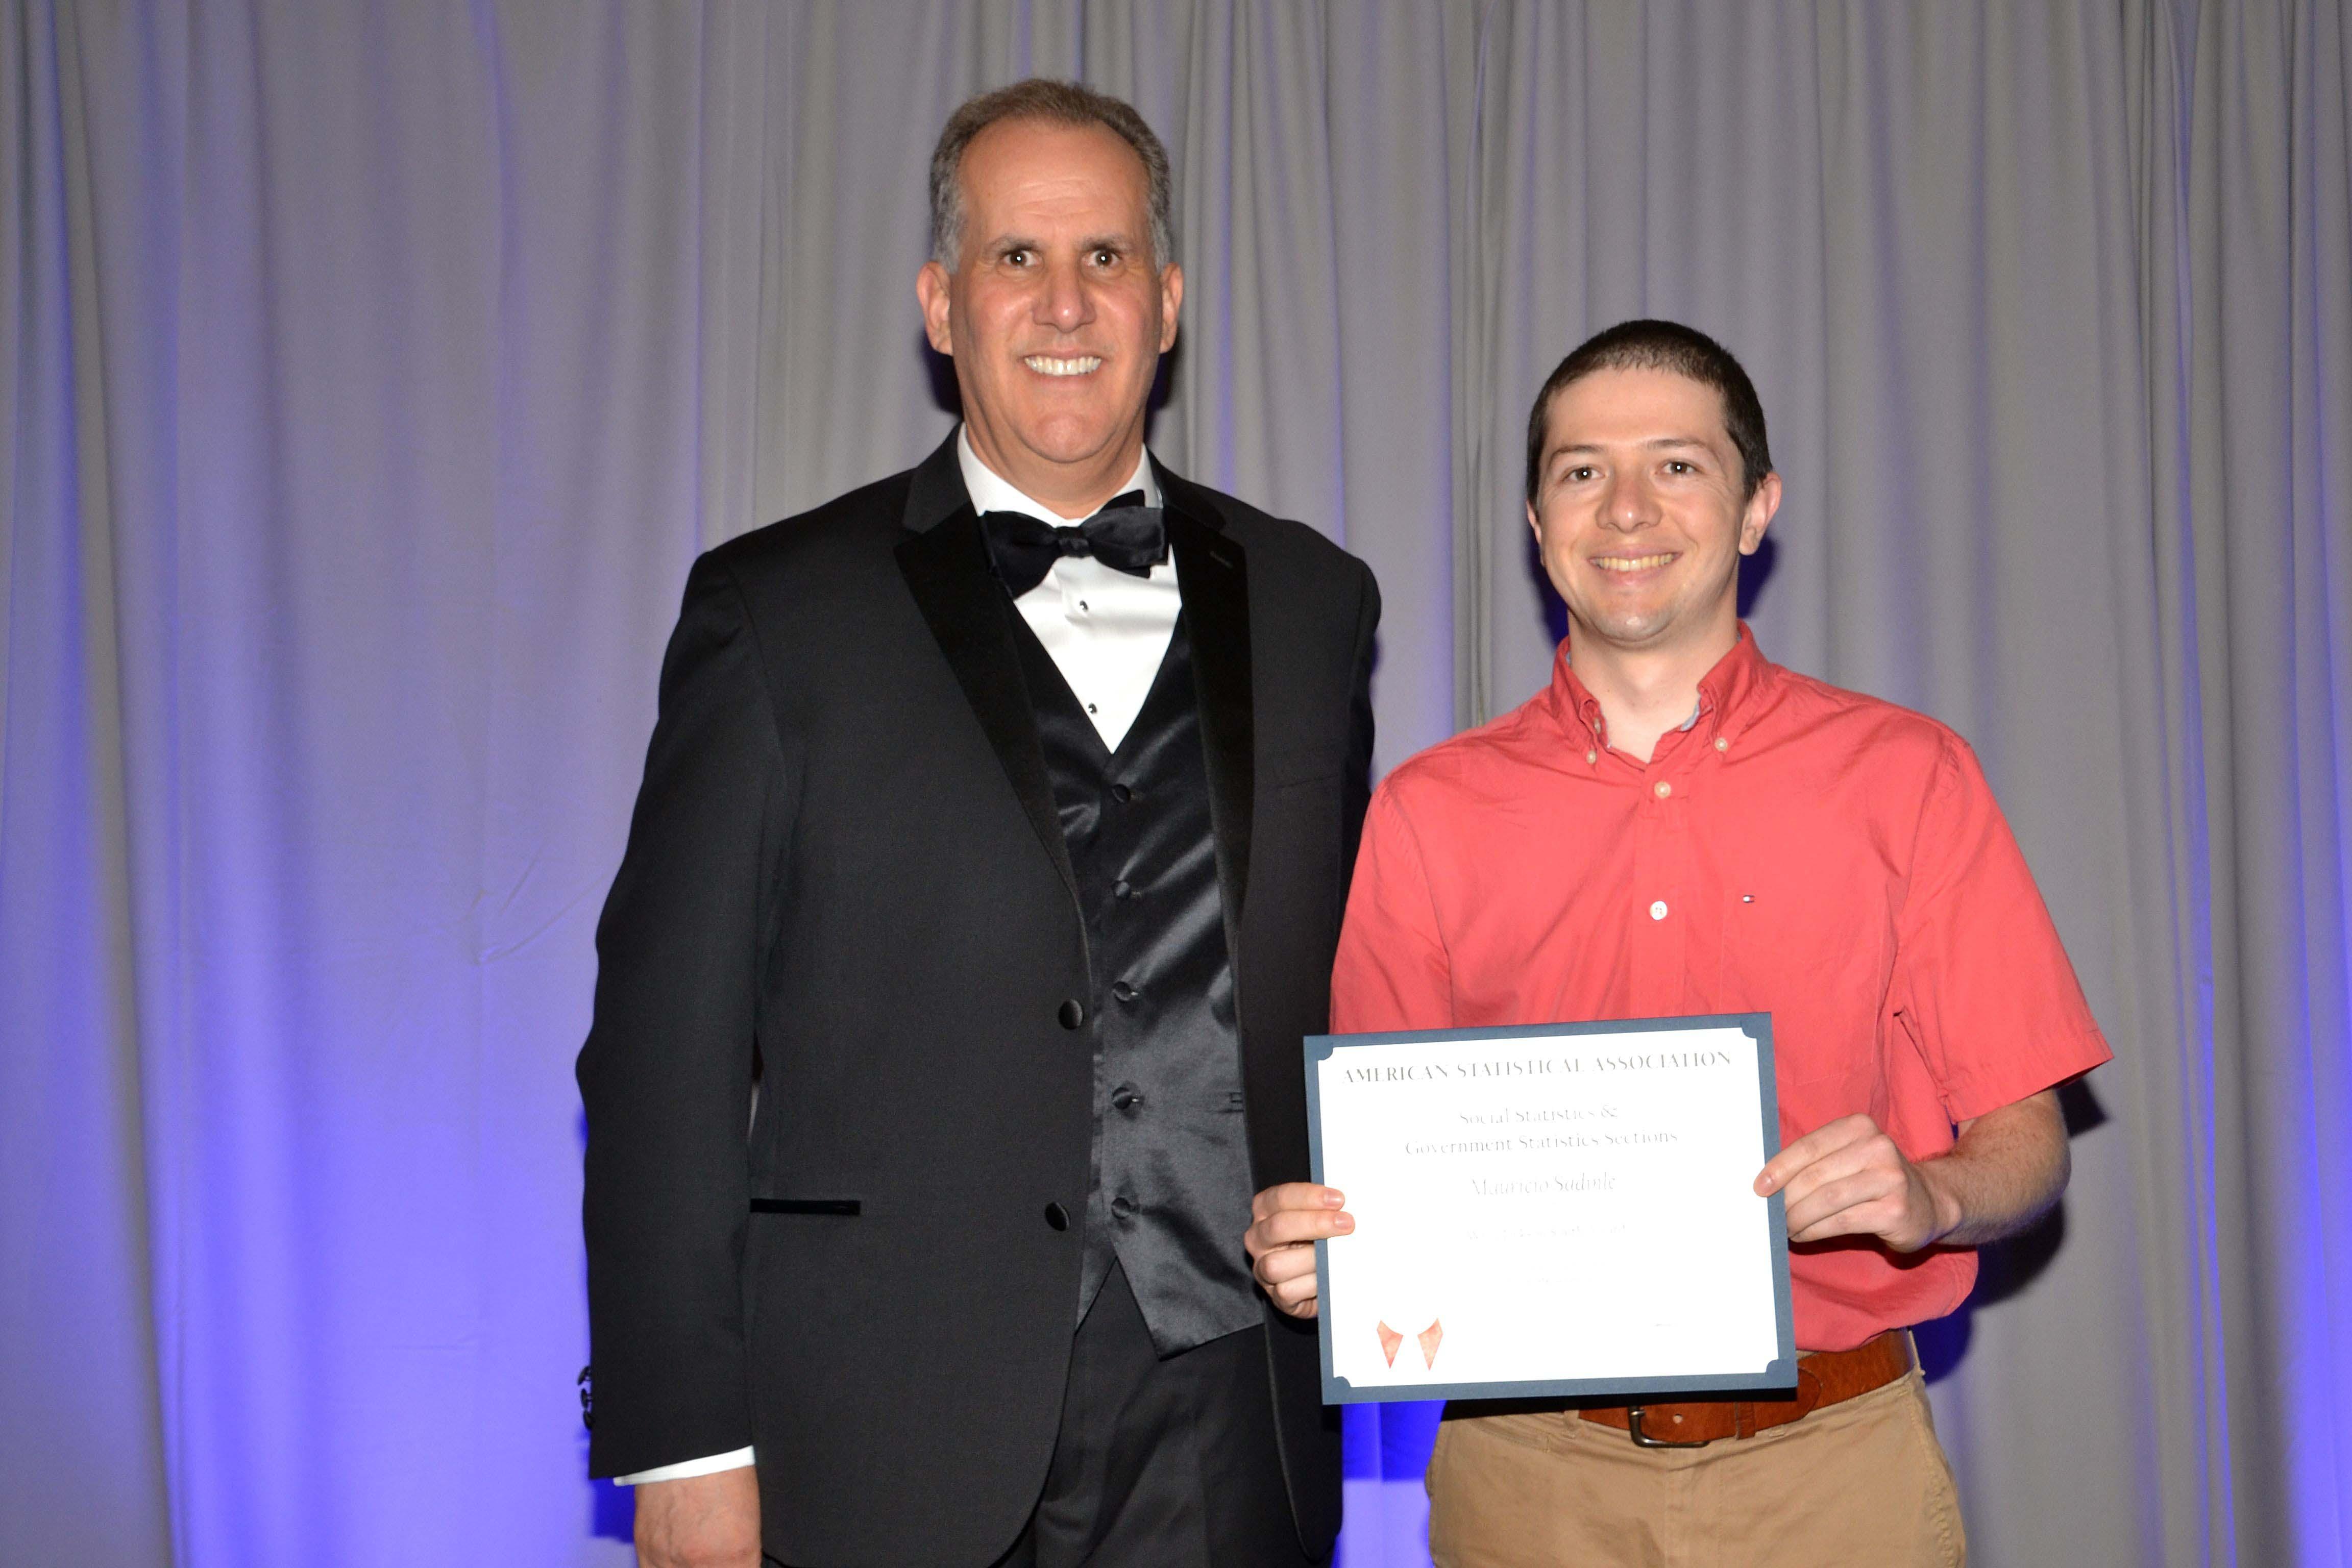 ASA President Nathaniel Schenker with Wray Jackson Smith Scholarship winner Mauricio Sadinle